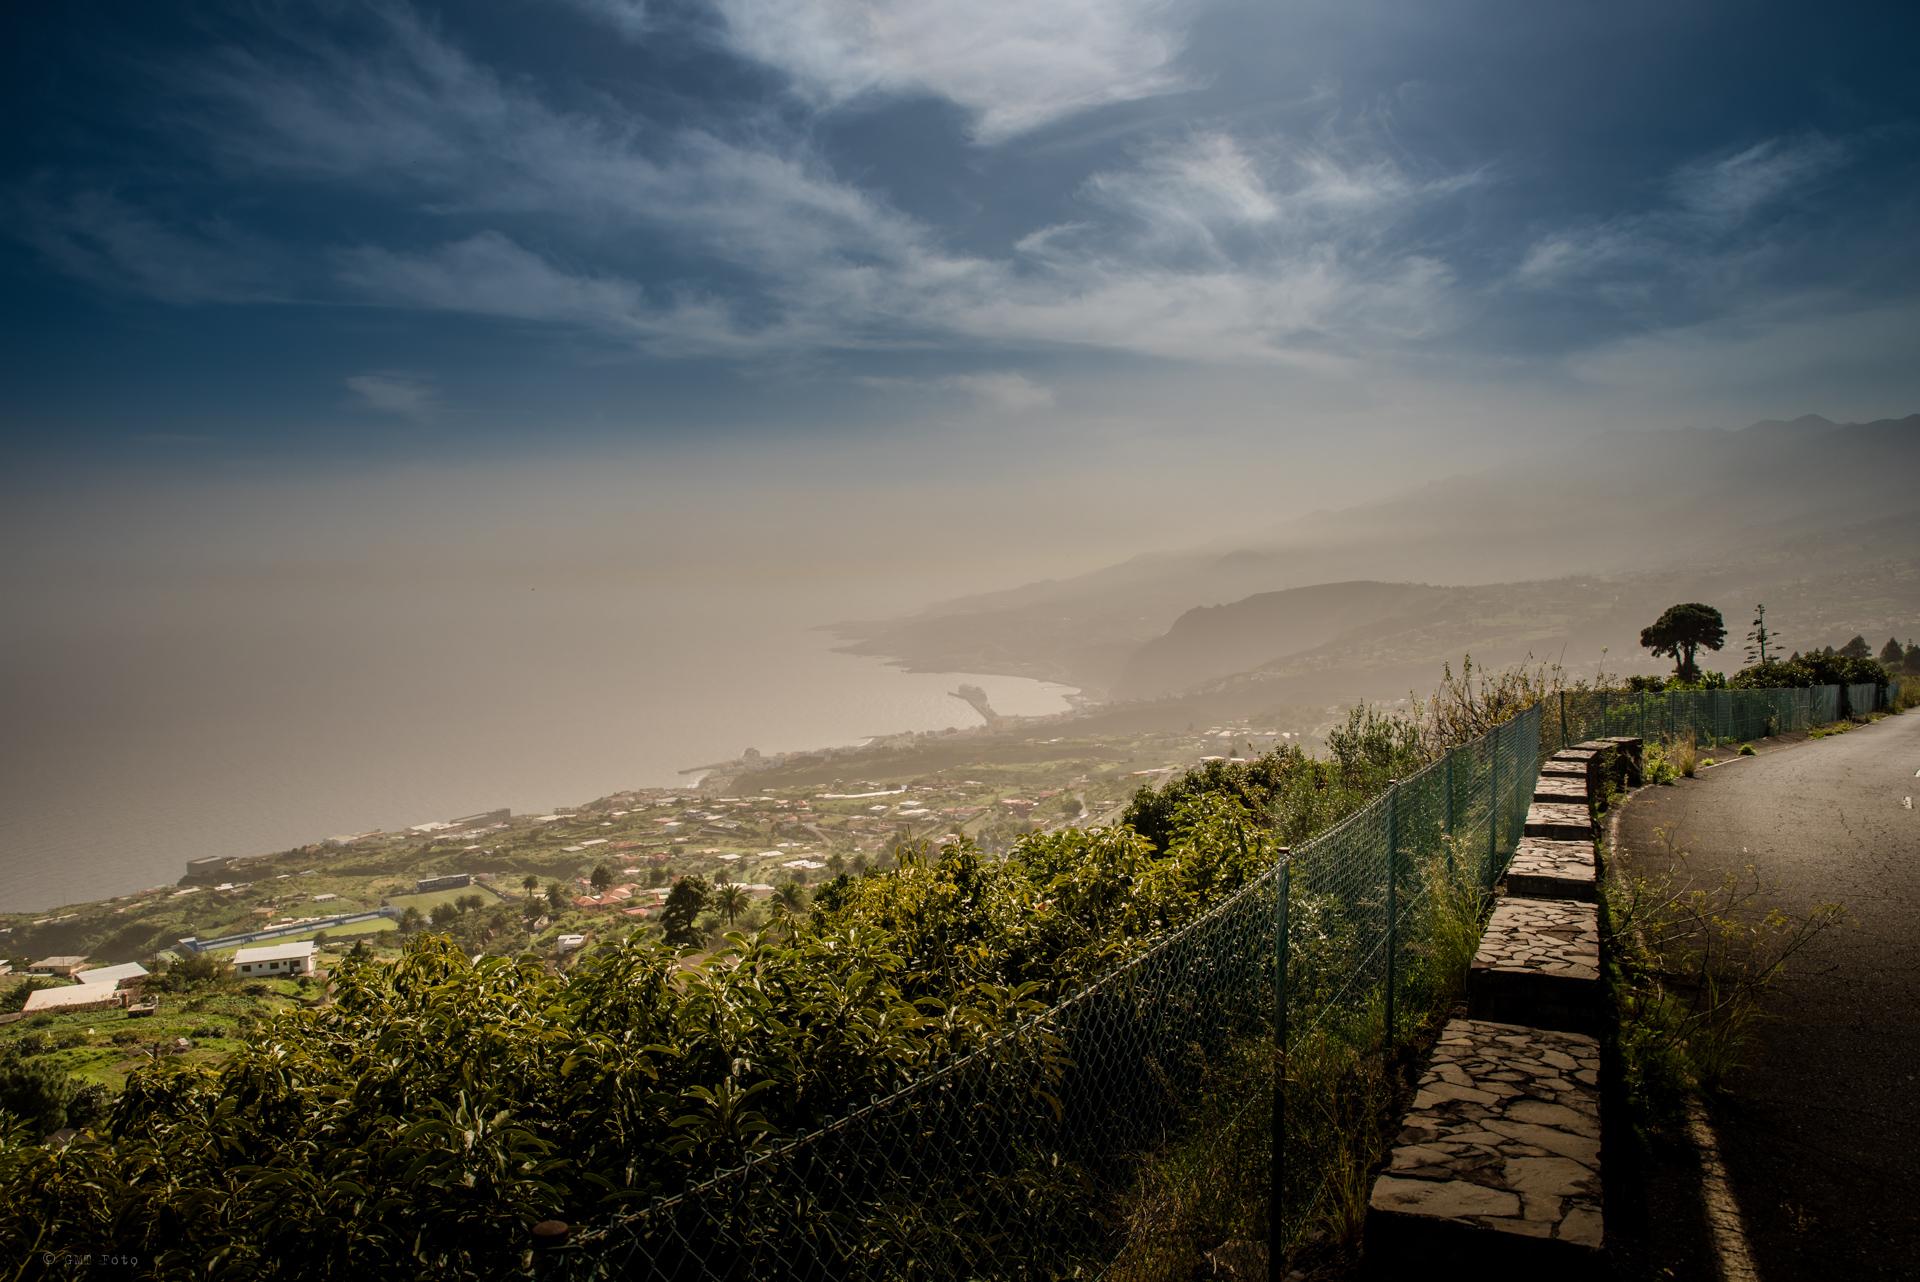 La Palma (Canary Islands)